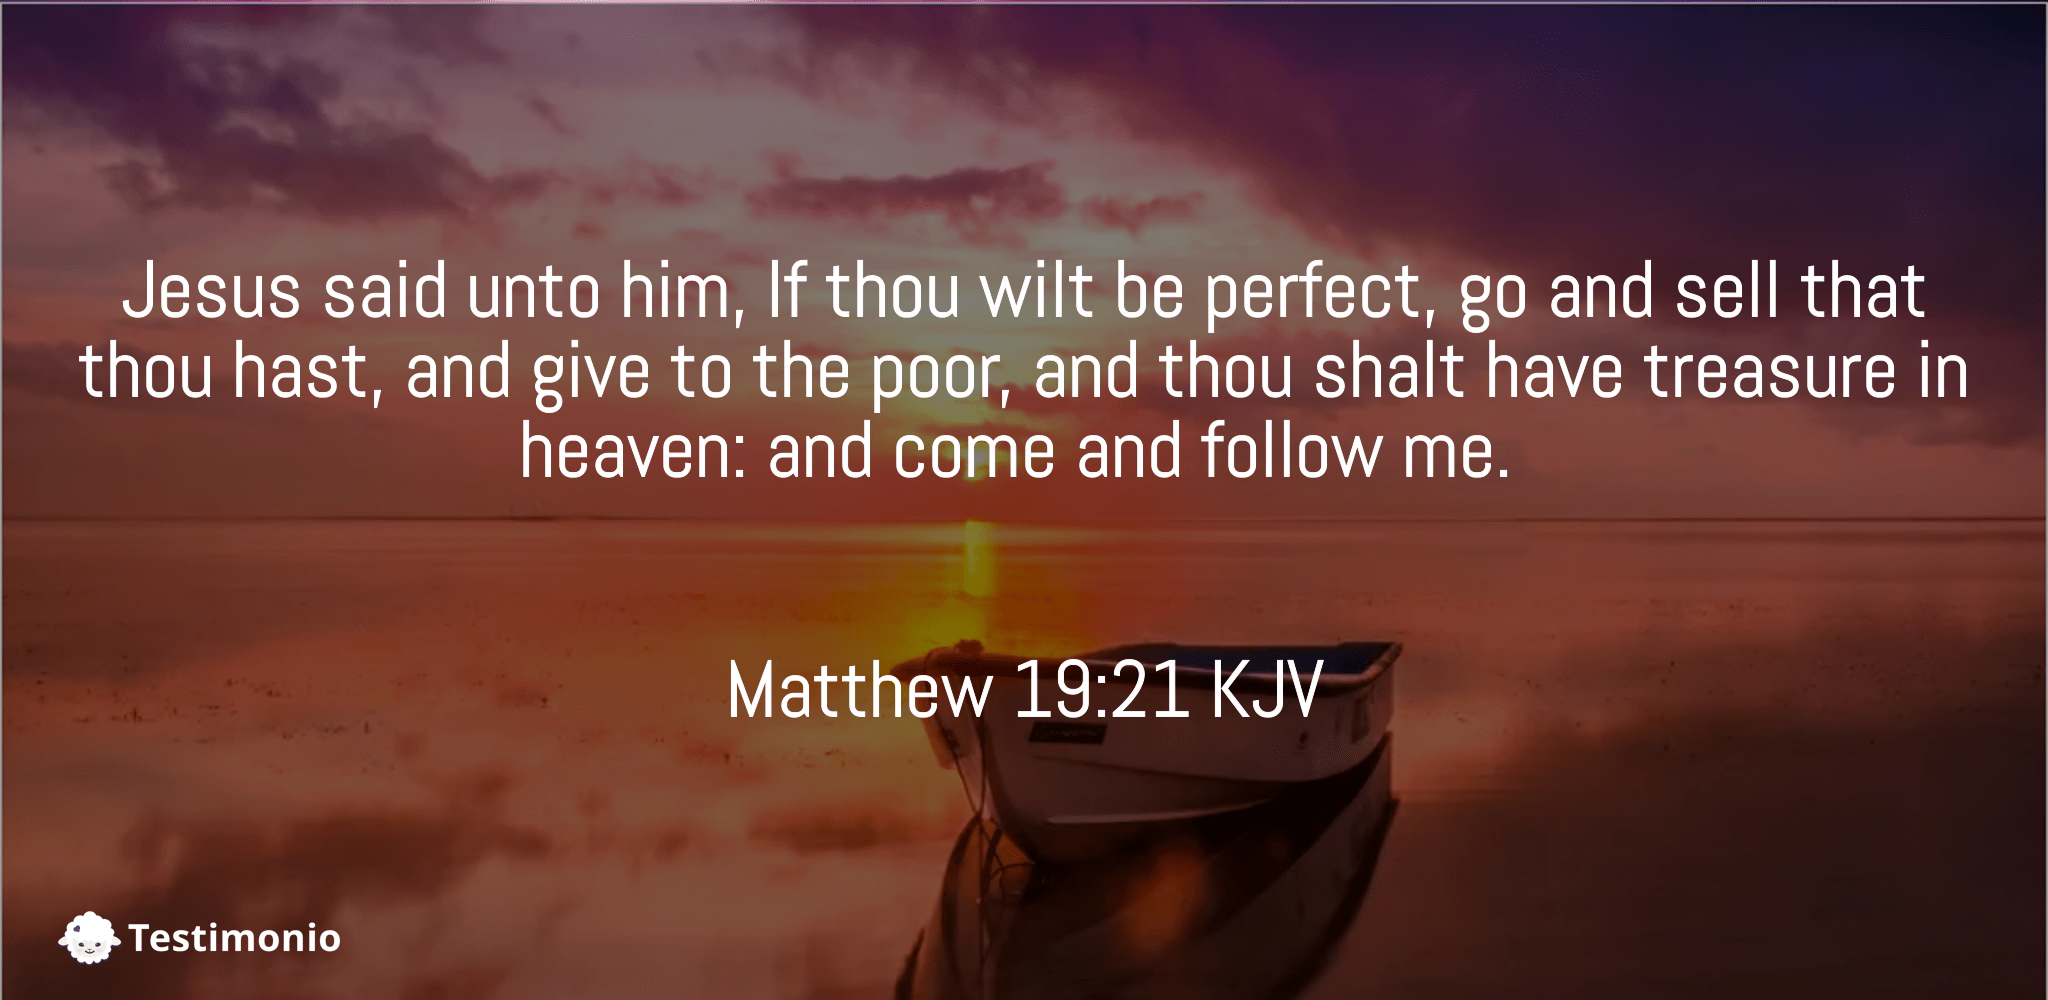 Matthew 19:21